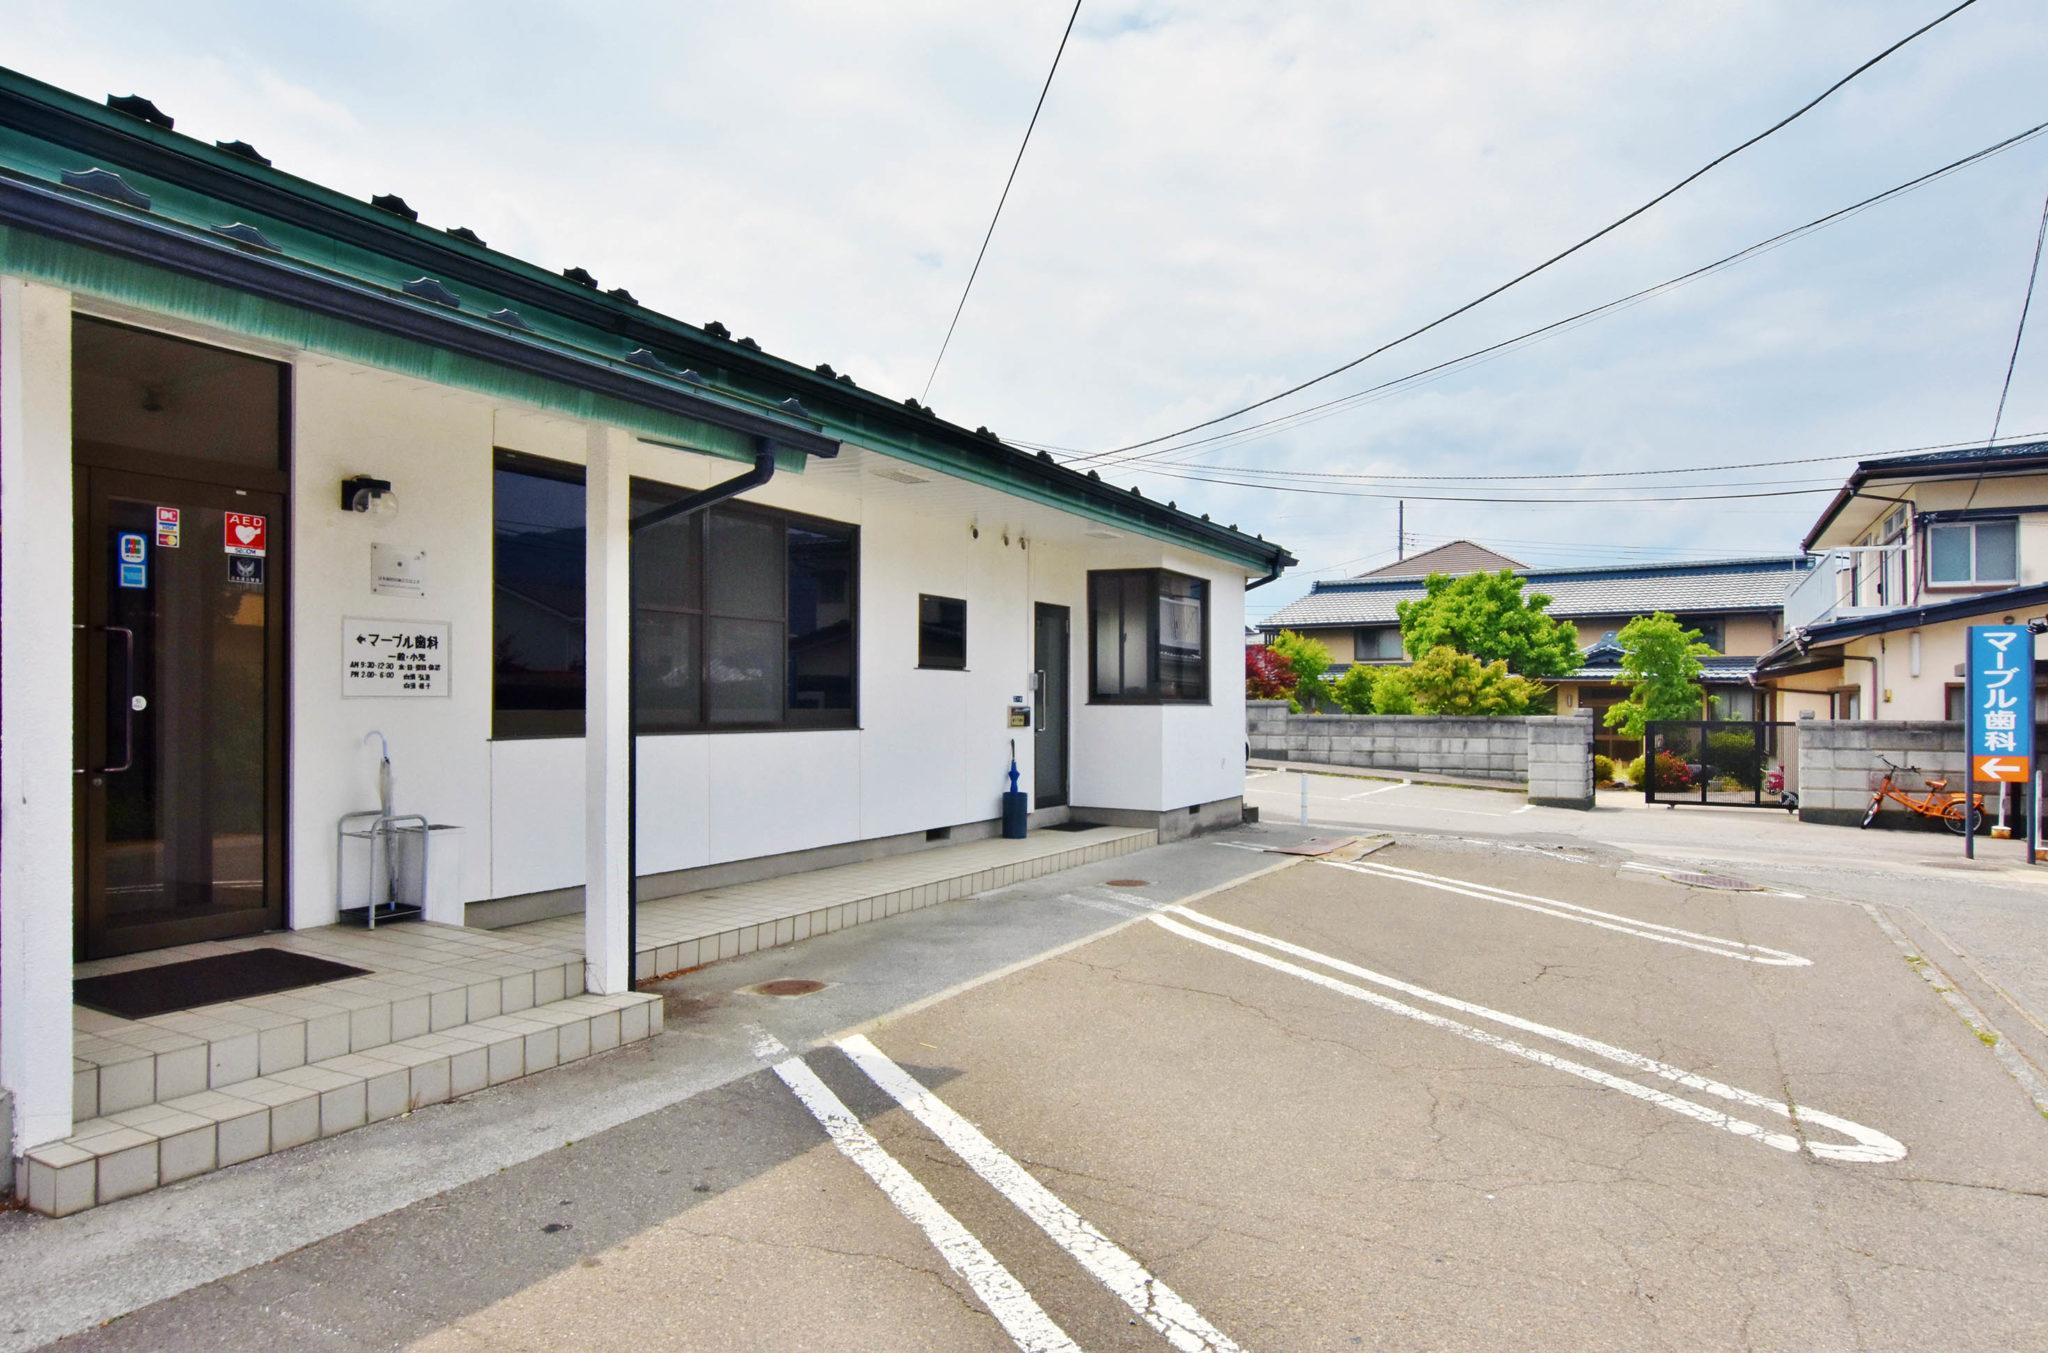 マーブル歯科 富士吉田市 病院 1